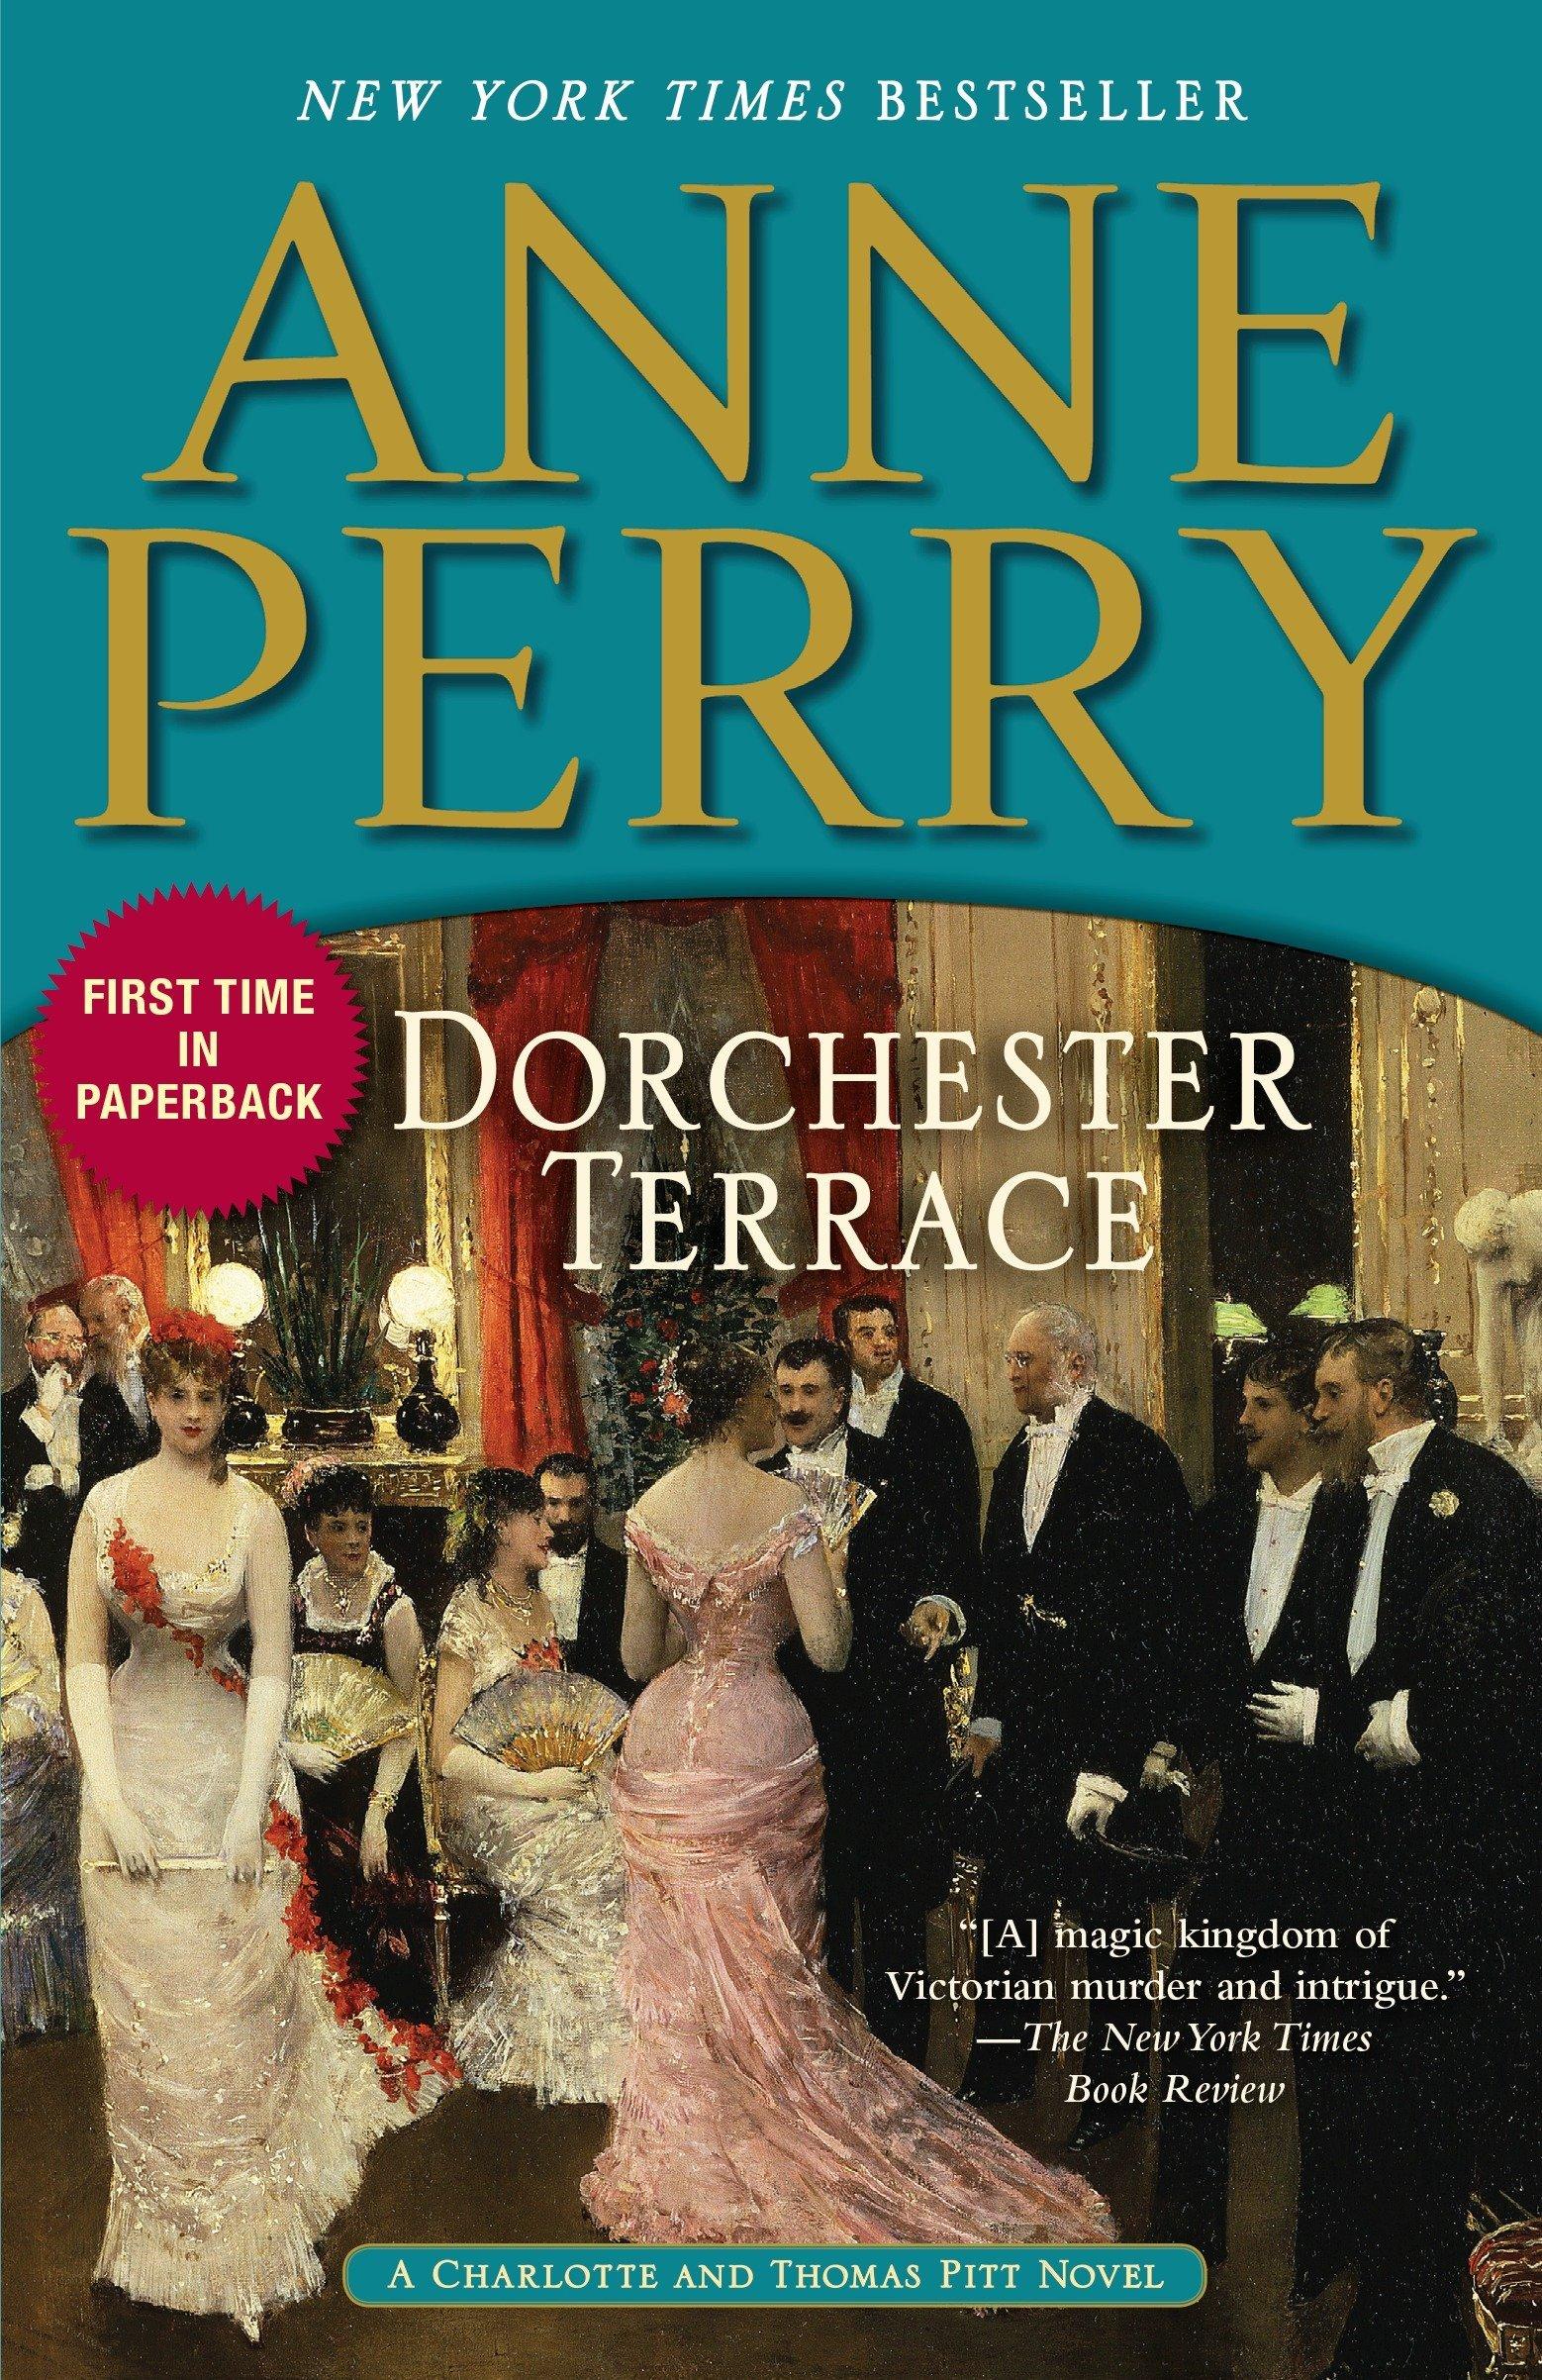 Dorchester Terrace: A Charlotte and Thomas Pitt Novel: Anne